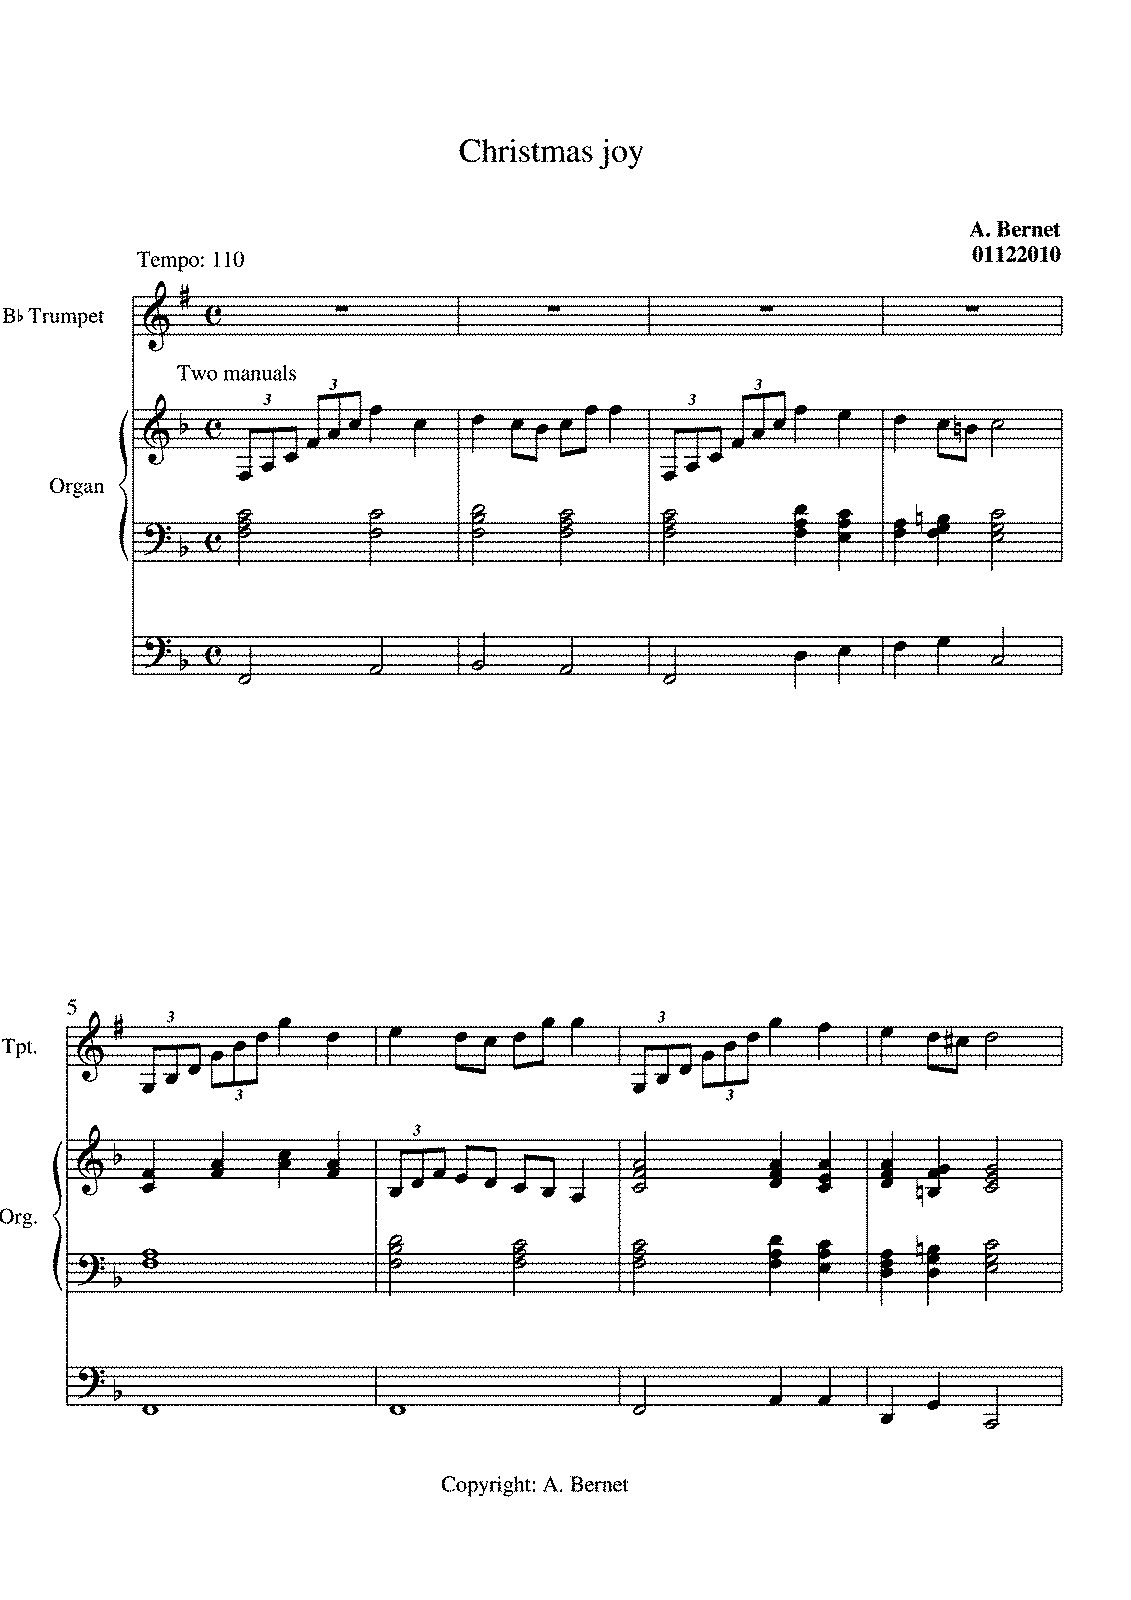 Christmas Joy (Bernet, Atie) - IMSLP/Petrucci Music Library: Free ...